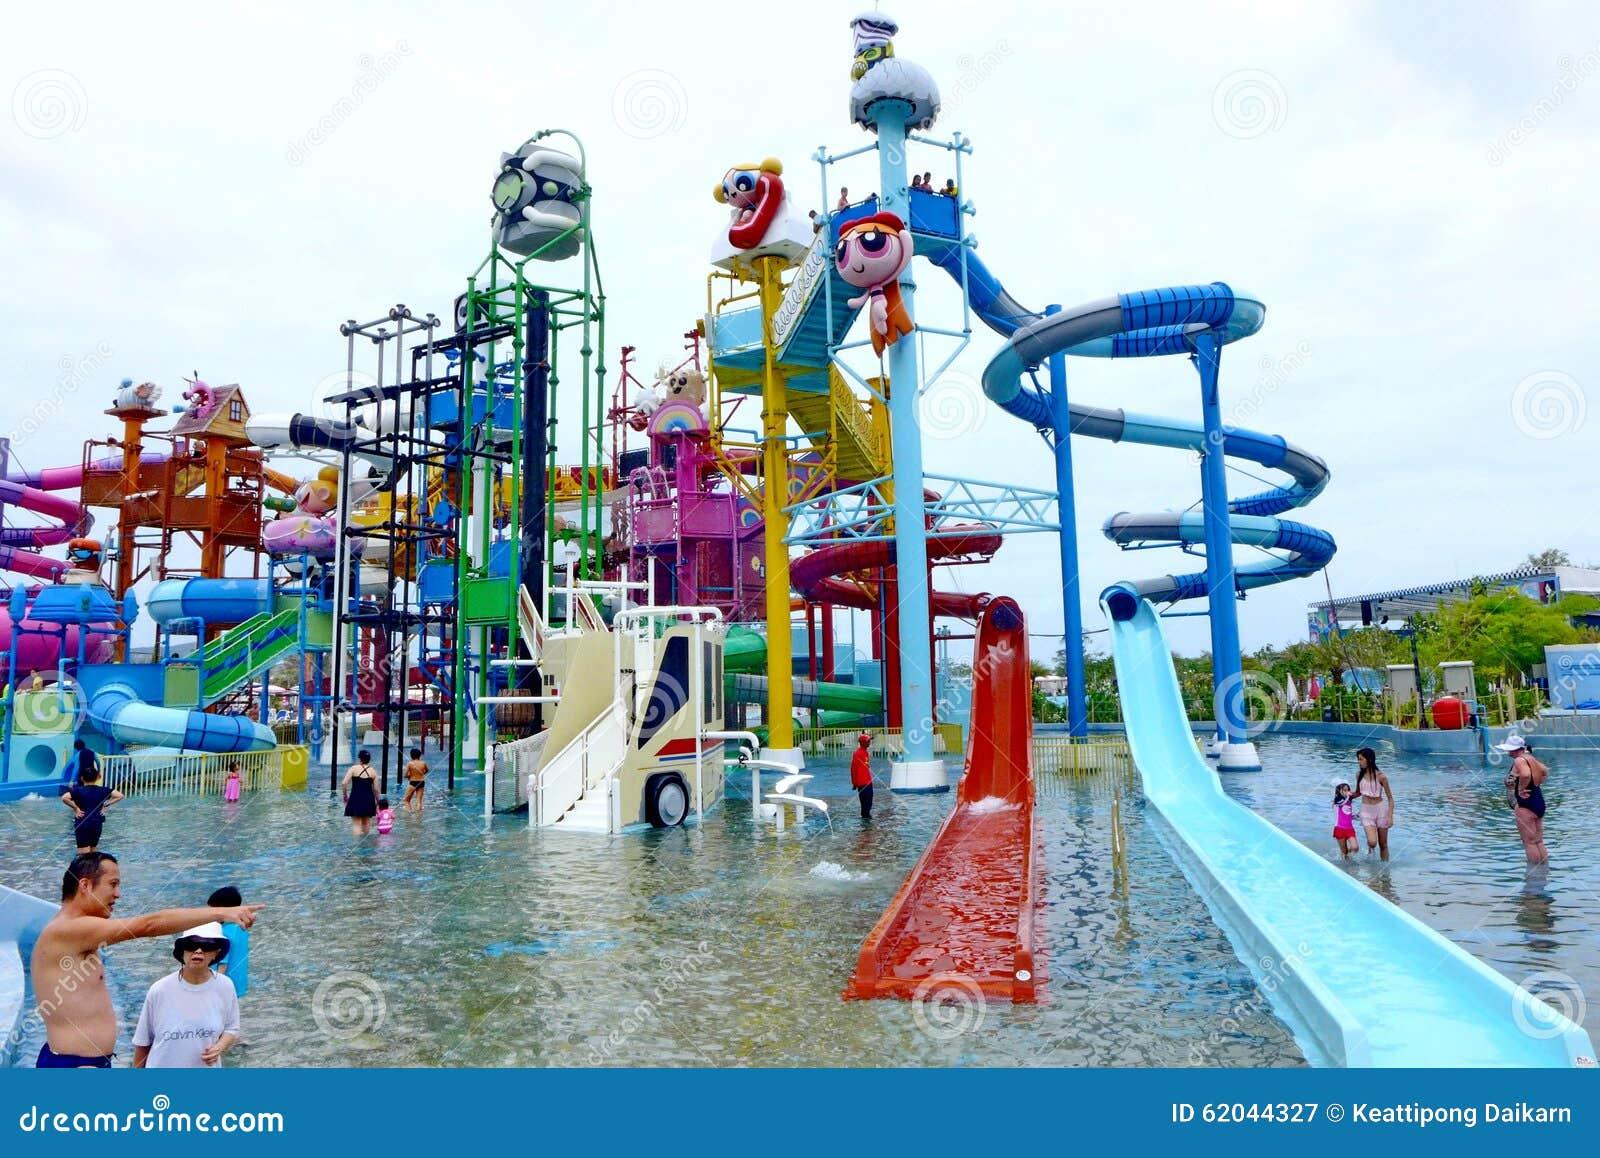 Pattaya cartoon network park